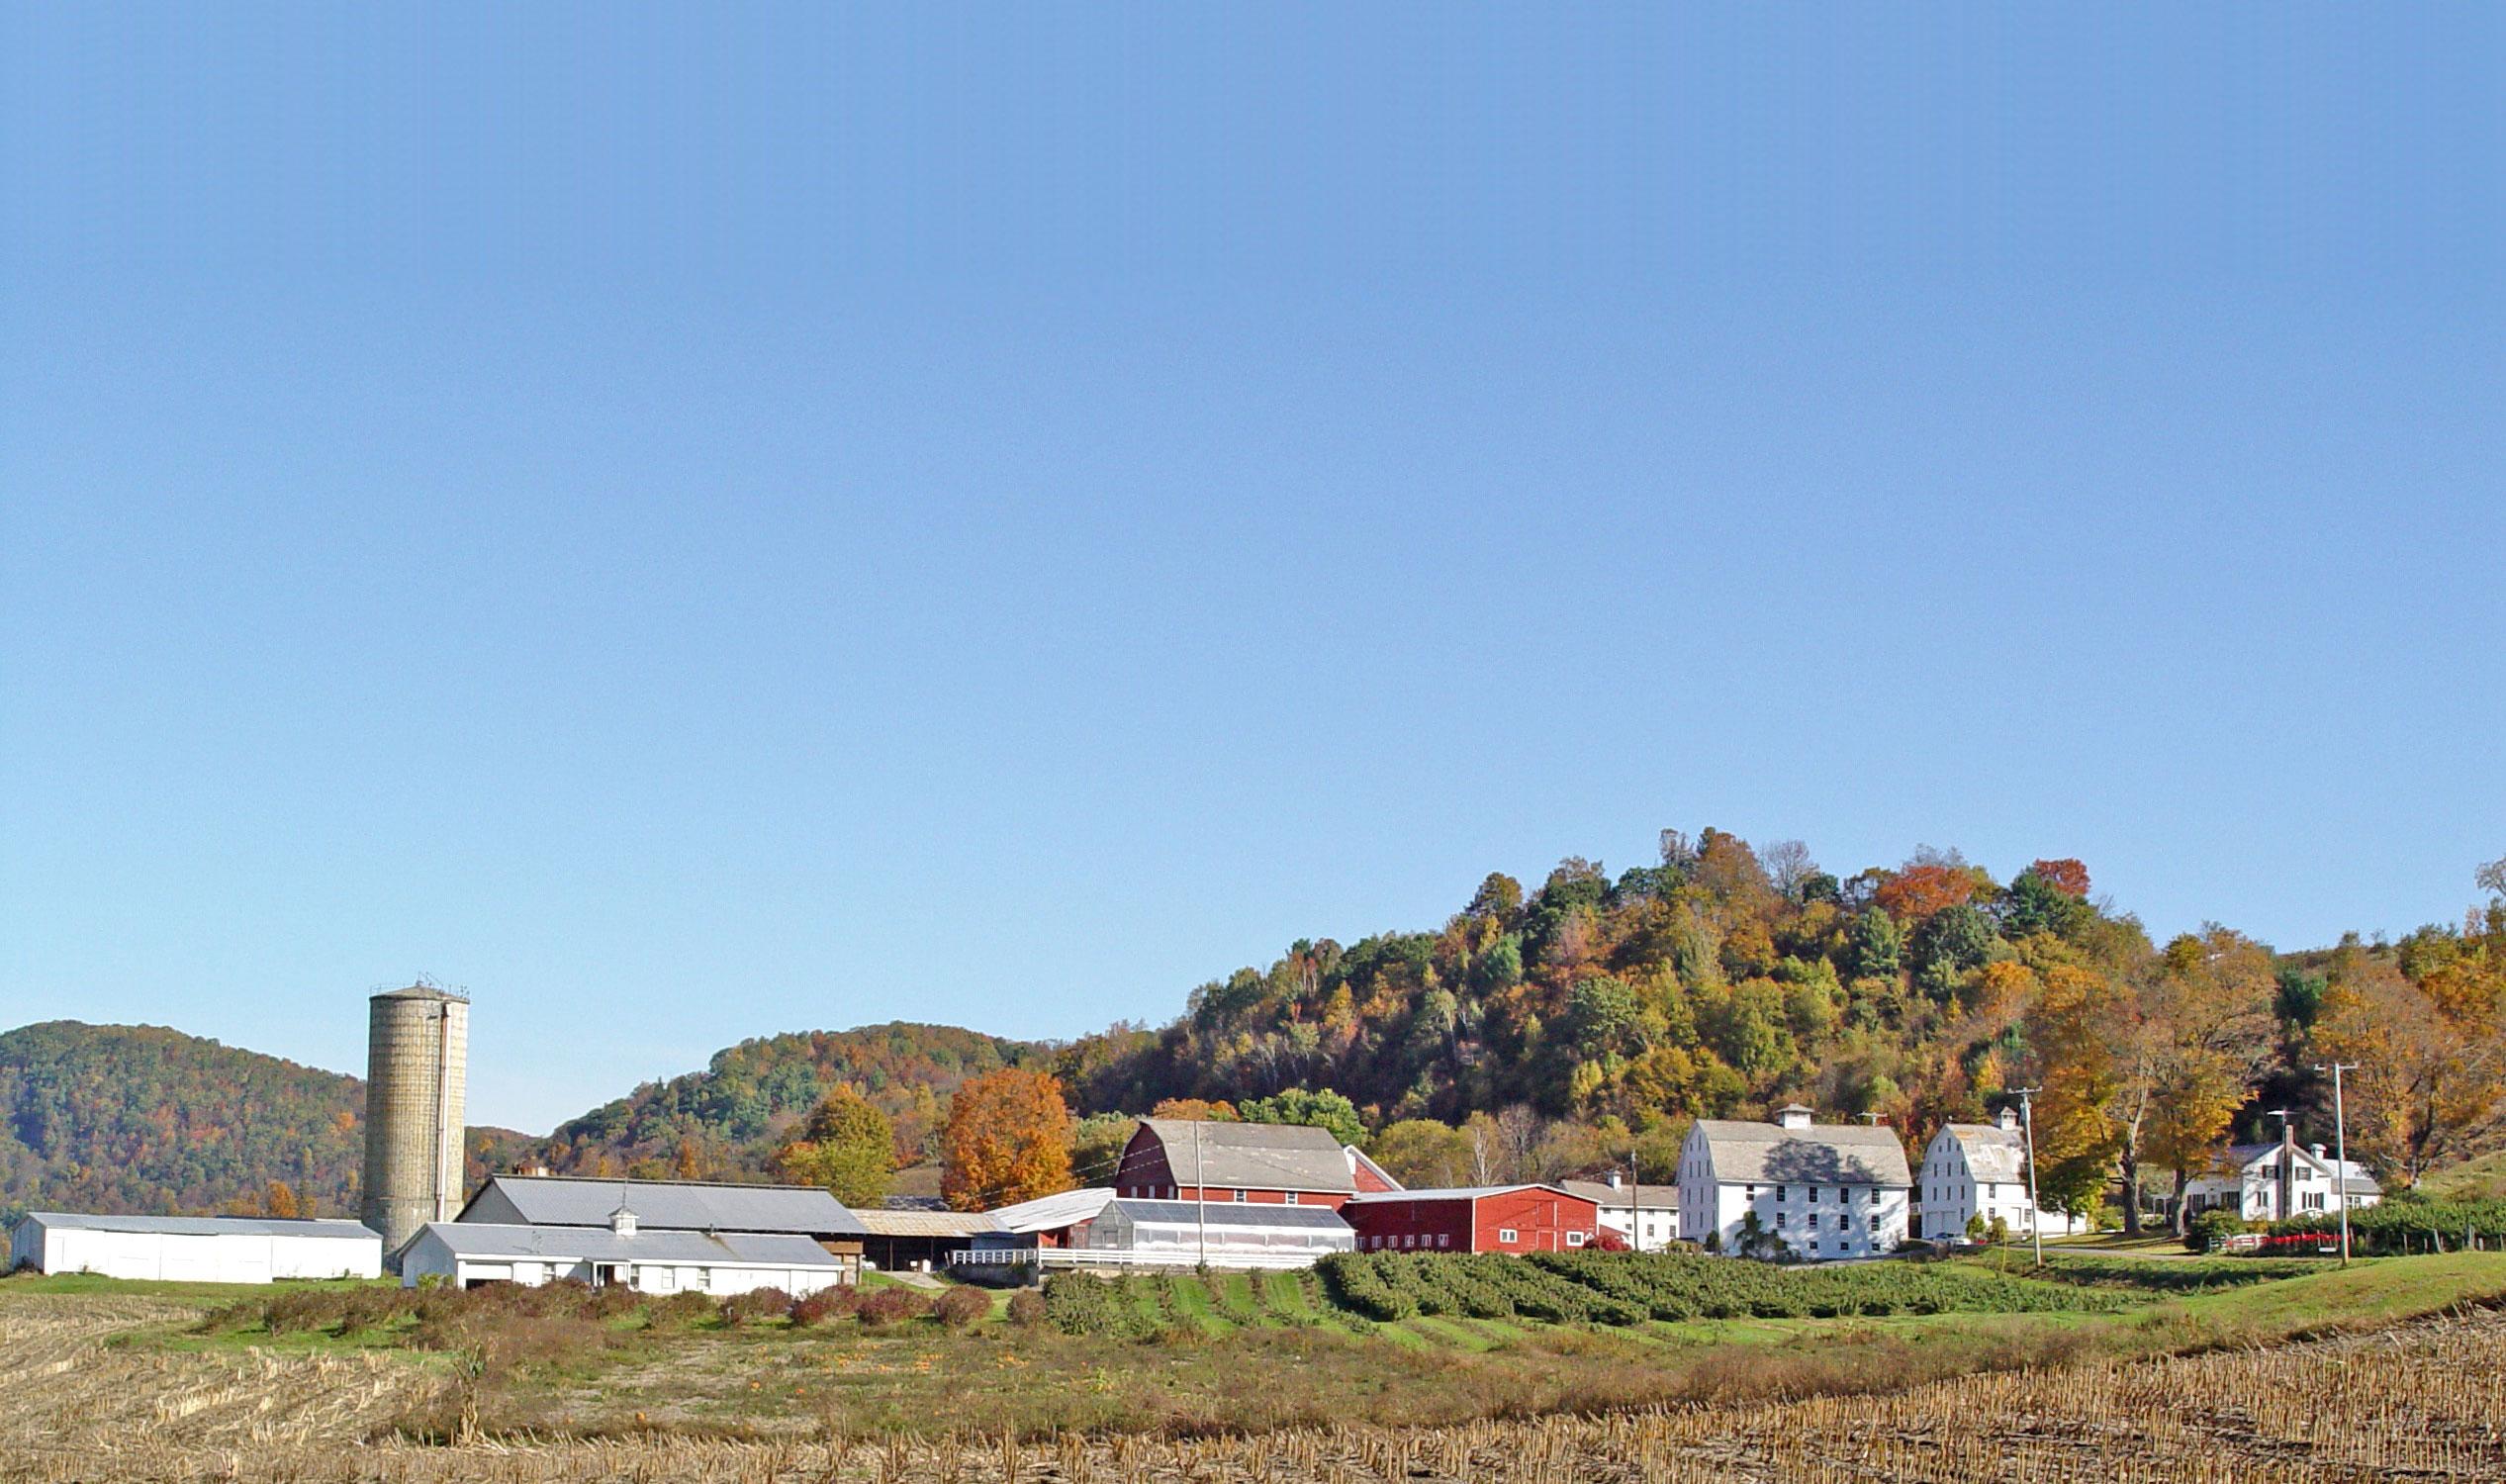 Gardenworks Farm